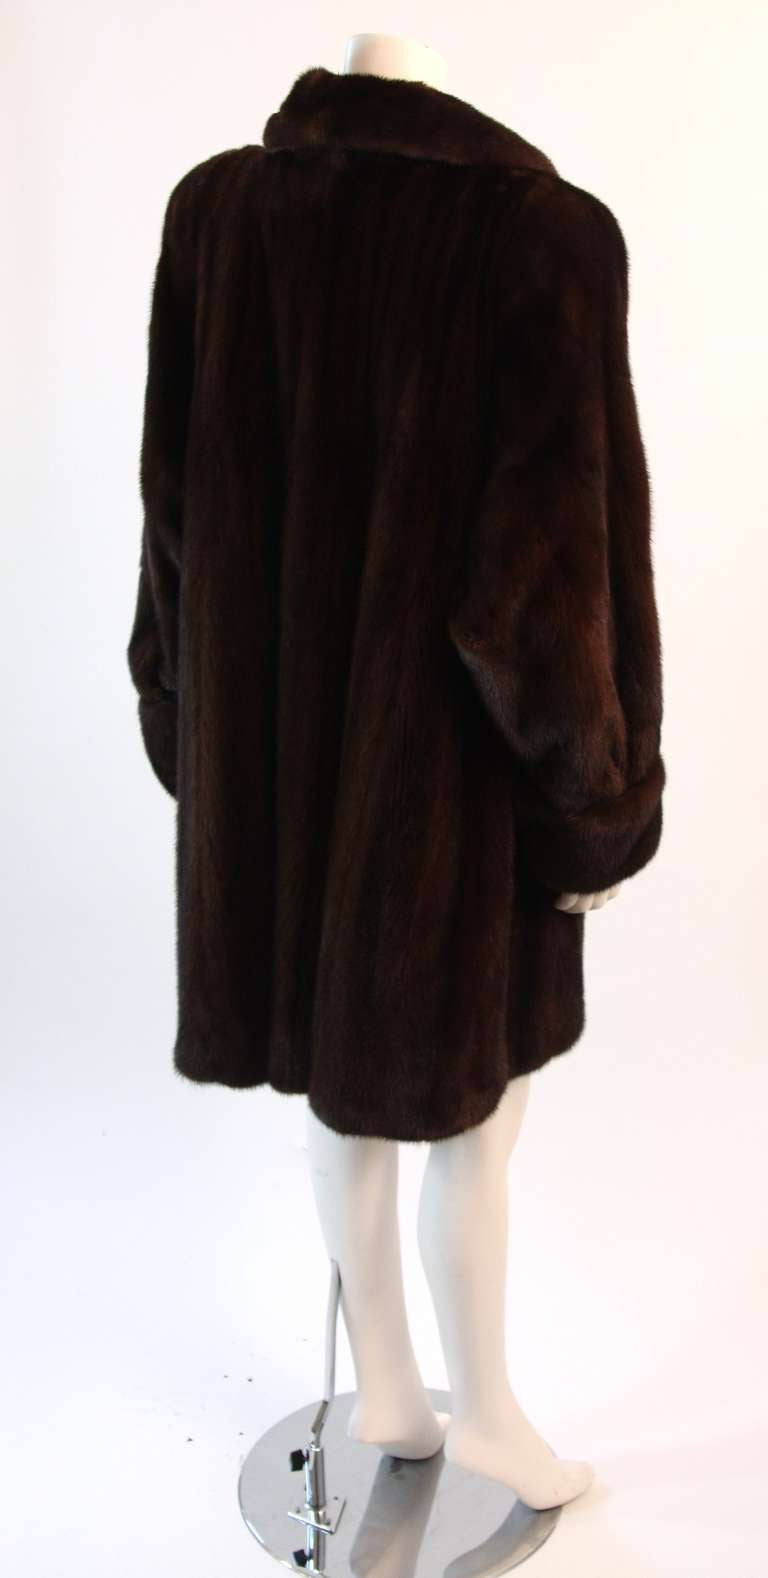 Luscious Somper Fur Couture Shawl Collar Mink 3/4 length Coat sz 6-8 5